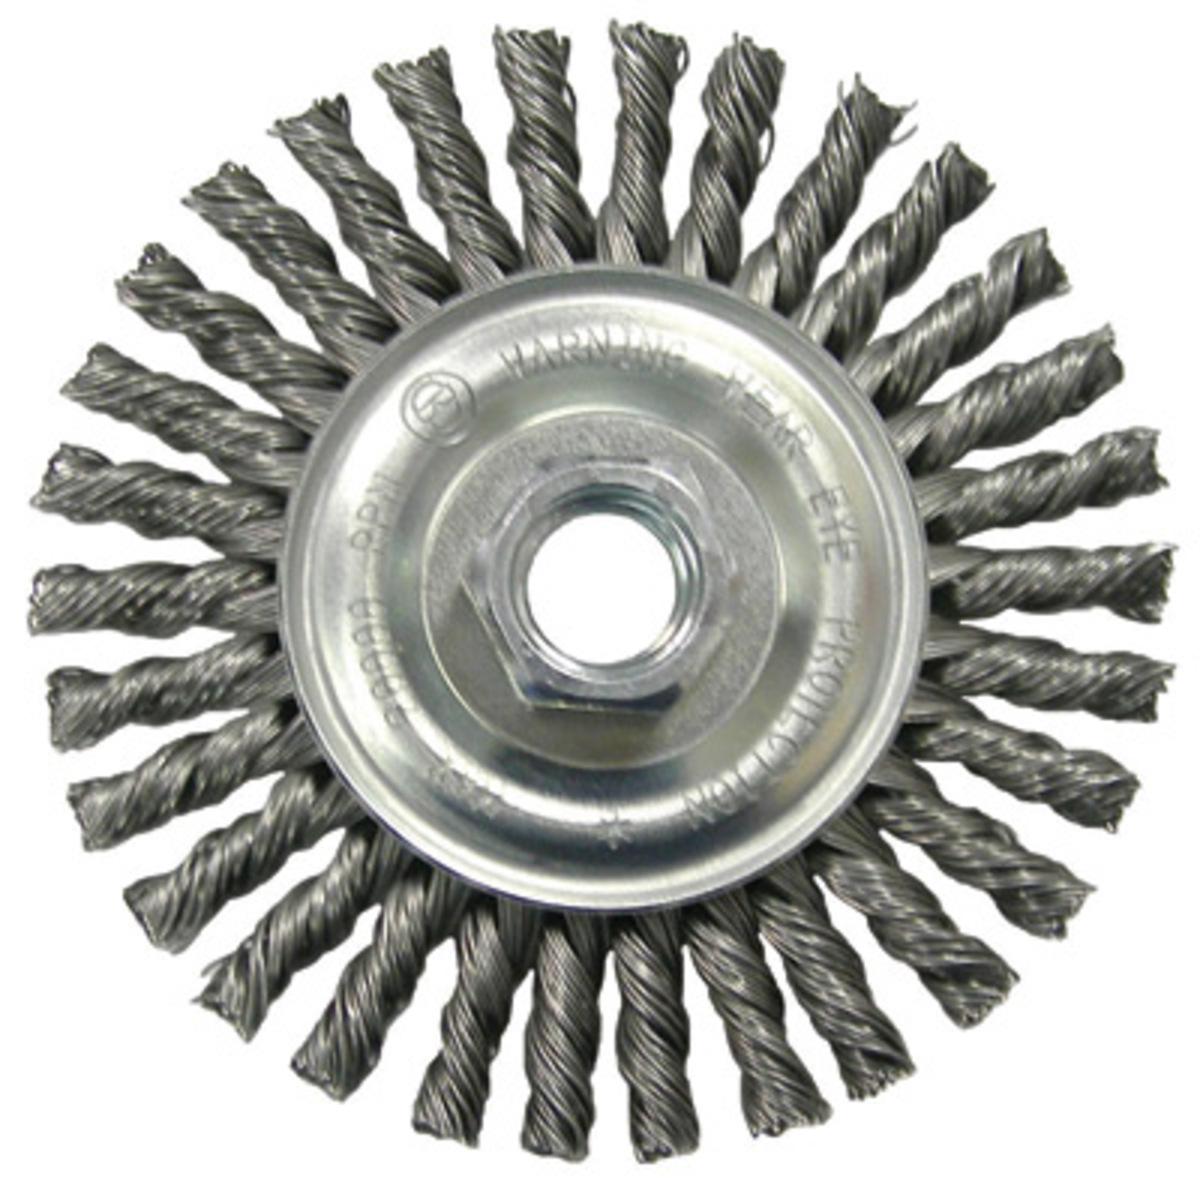 Airgas RAD64000386 Radnor reg 4 quot X 5 8 quot 11 quot Stainless